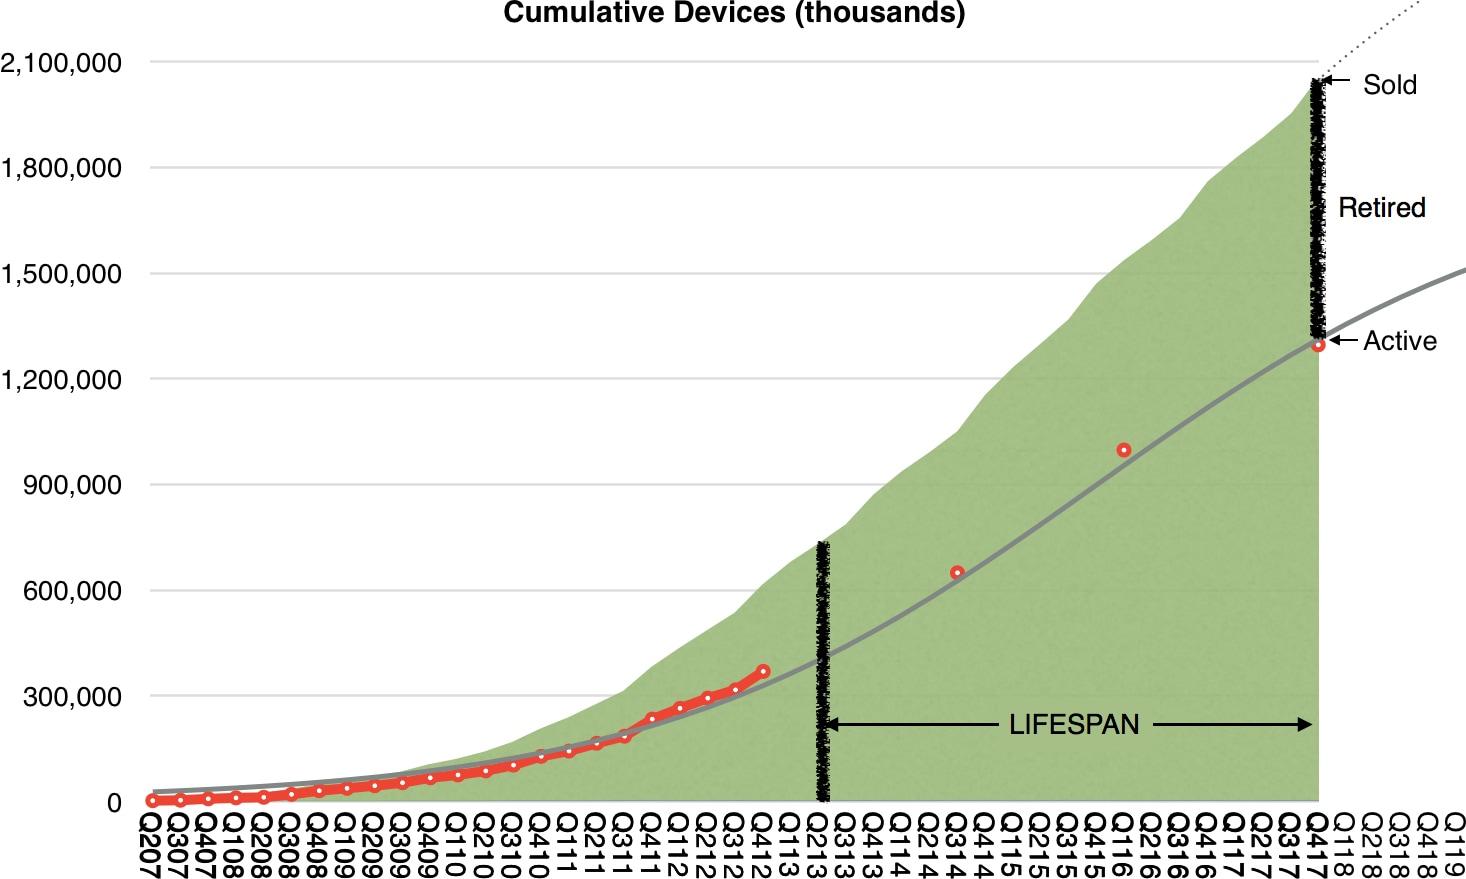 Vida útil dos dispositivos Apple